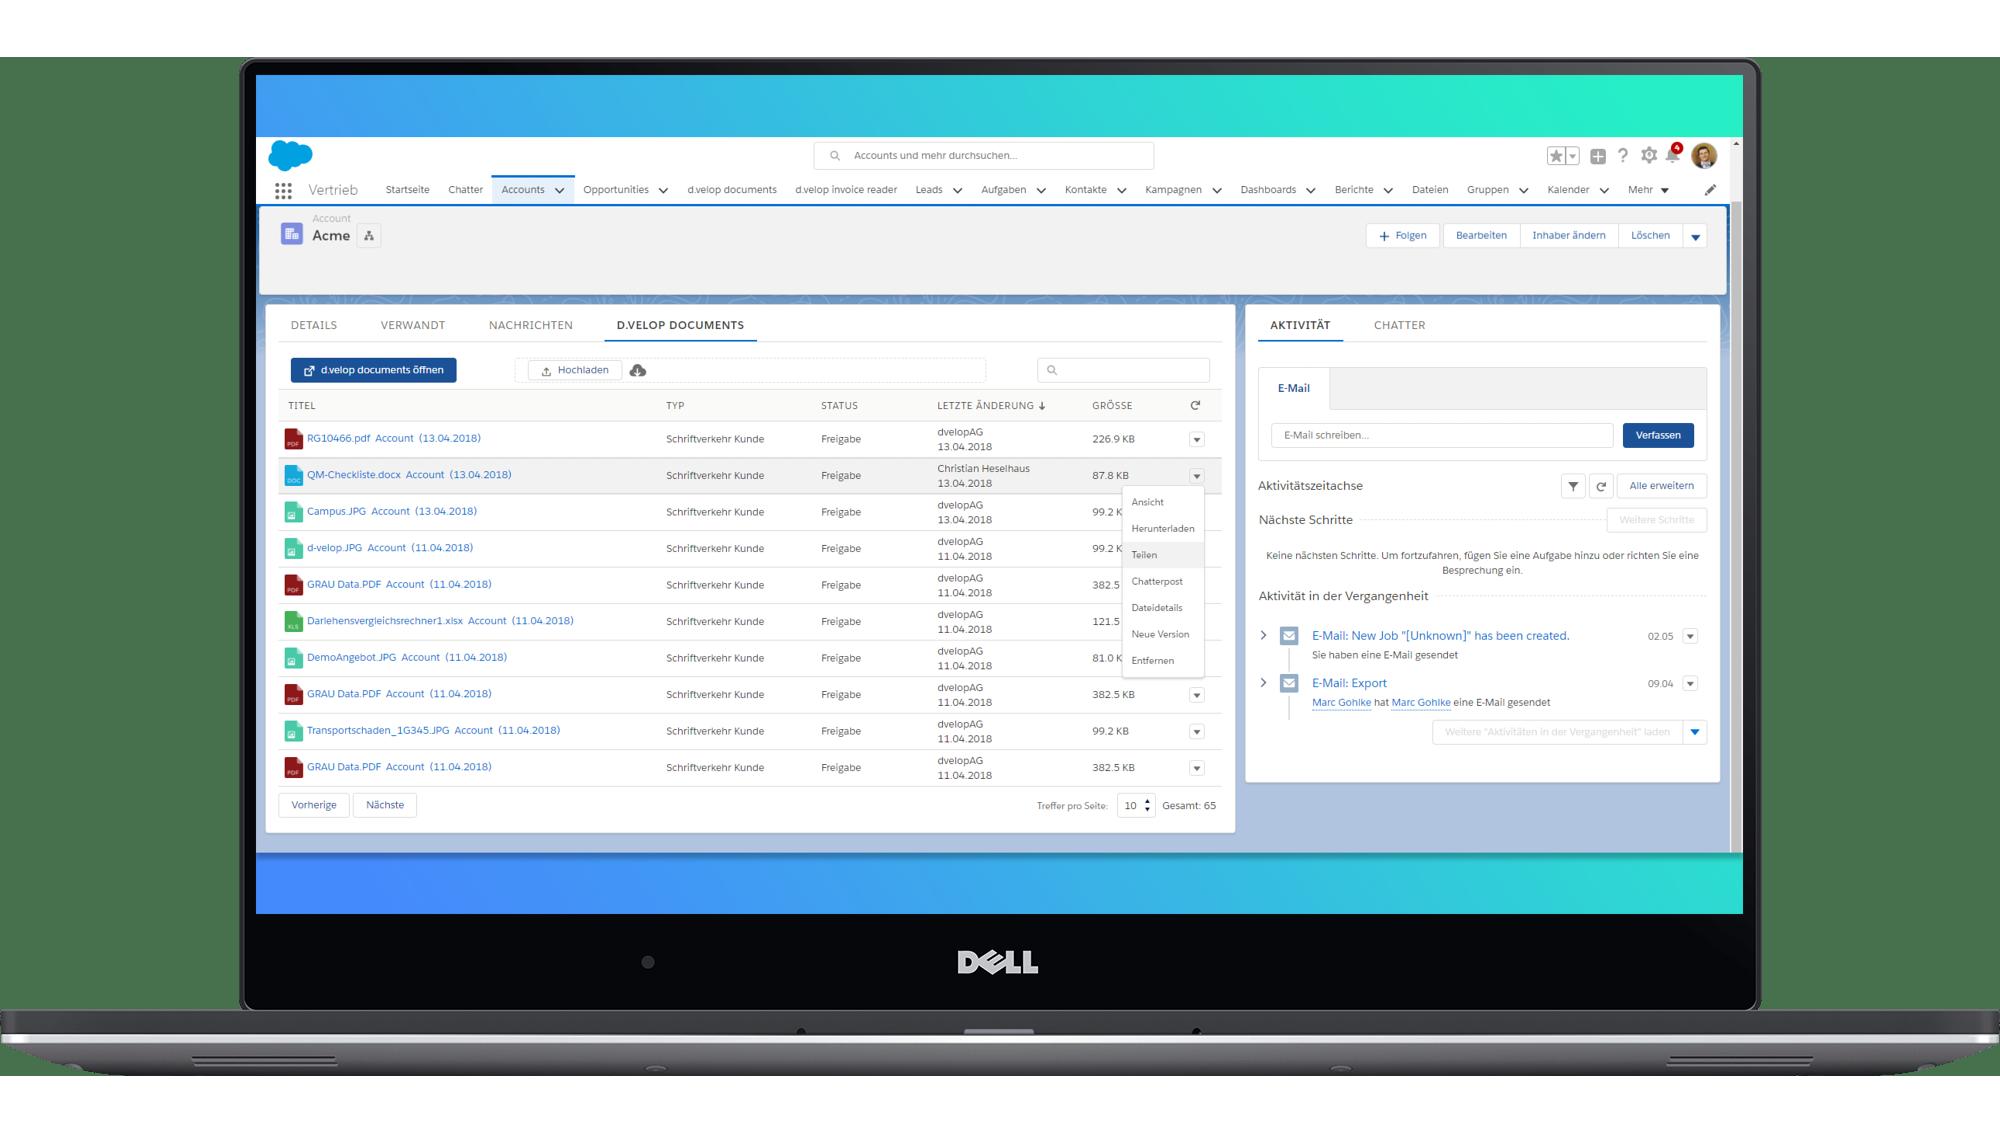 d-velop-documents-for-salesforce-integration.png